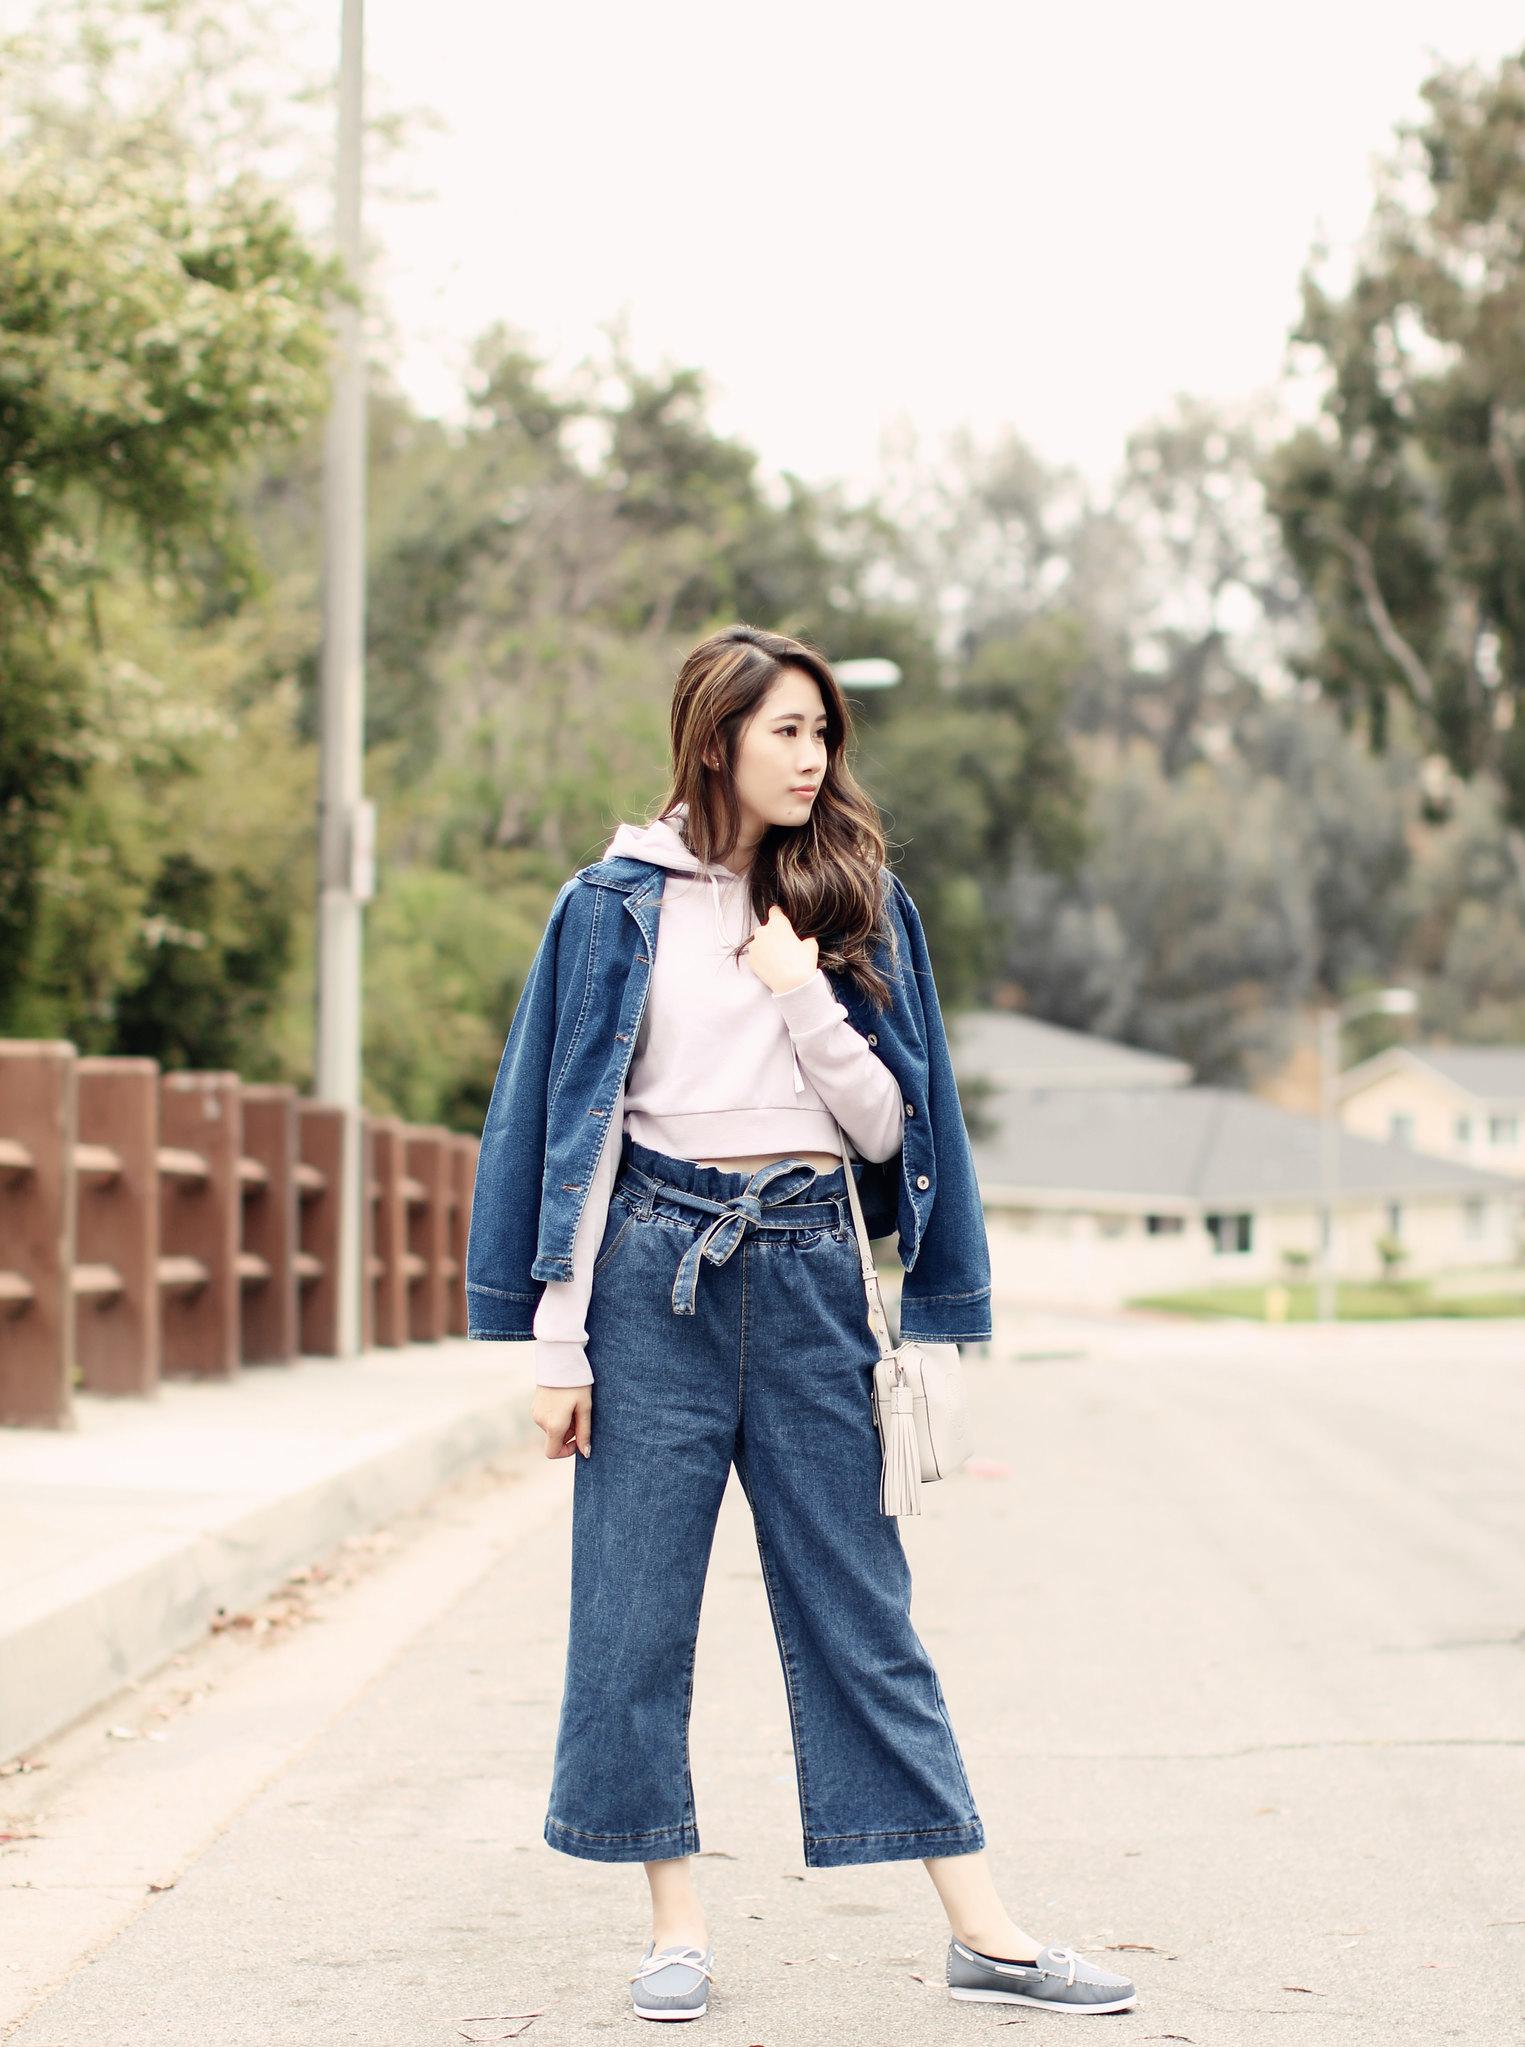 5084-ootd-fashion-style-outfitoftheday-wiwt-streetstyle-zara-f21xme-denim-thrifted-guess-koreanfashion-lookbook-elizabeeetht-clothestoyouuu